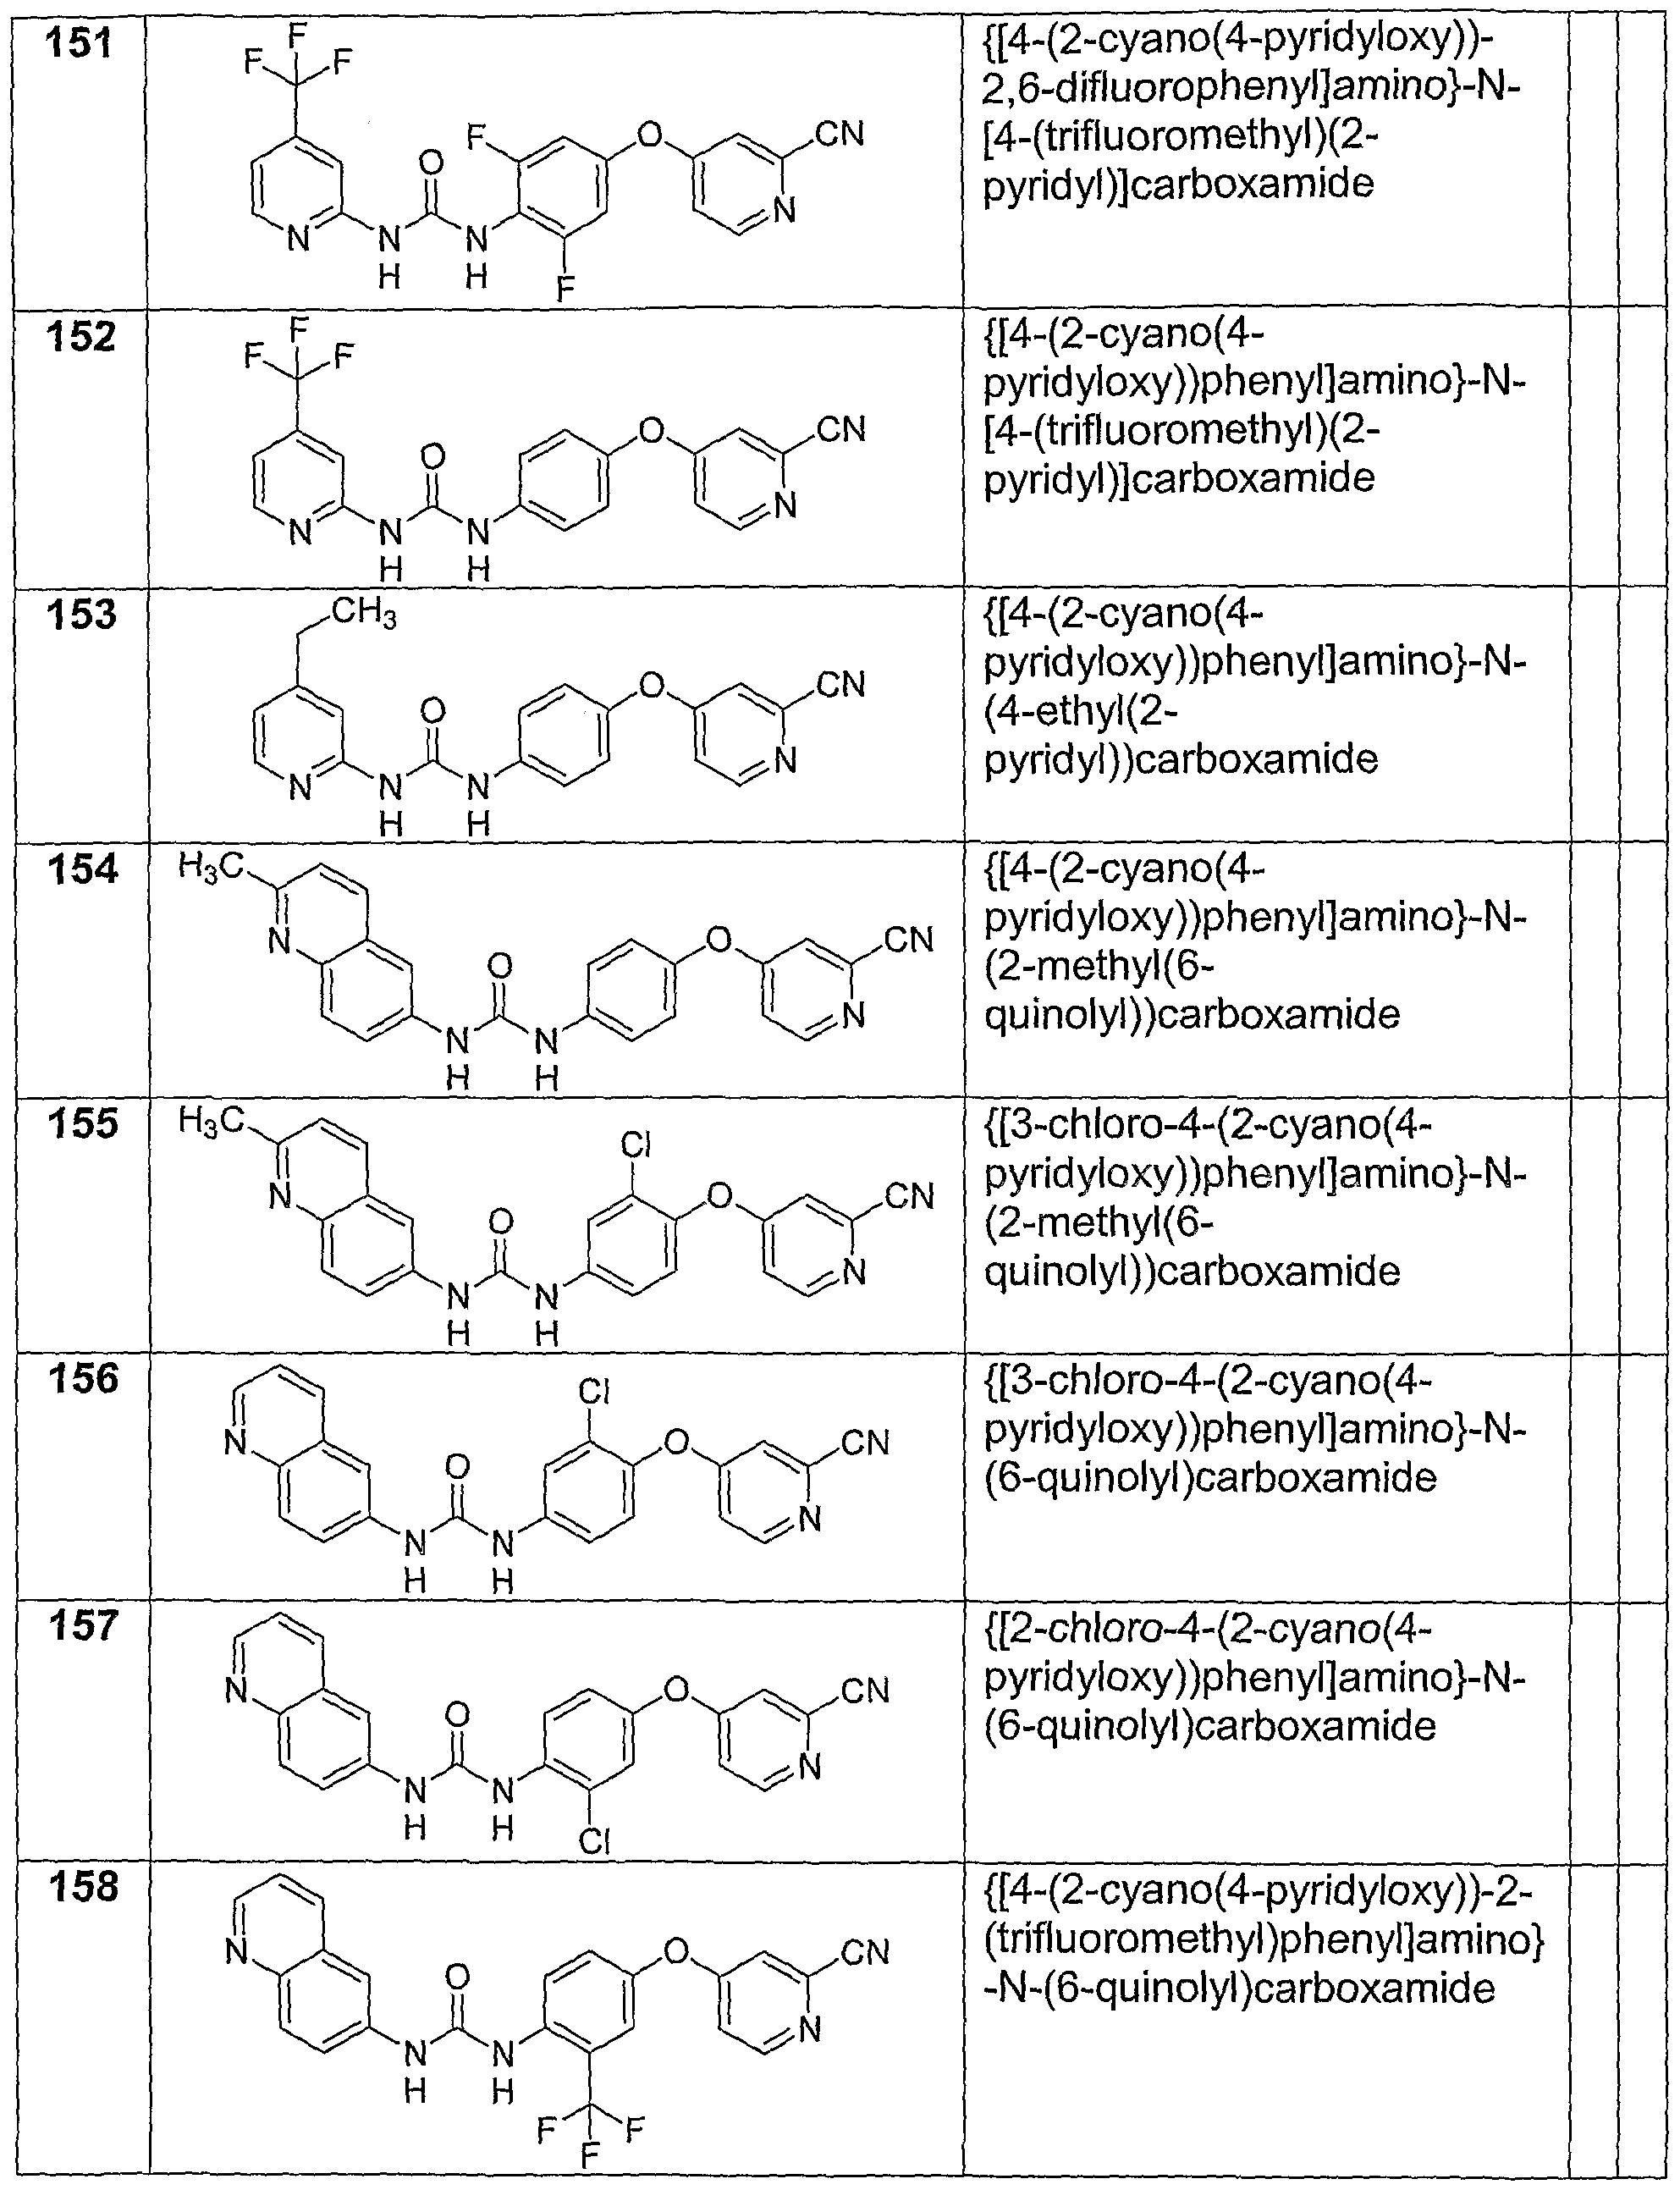 wo2004078747a1 novel cyanopyridine derivatives useful in the 1956 Dodge Royal figure imgf000088 0001